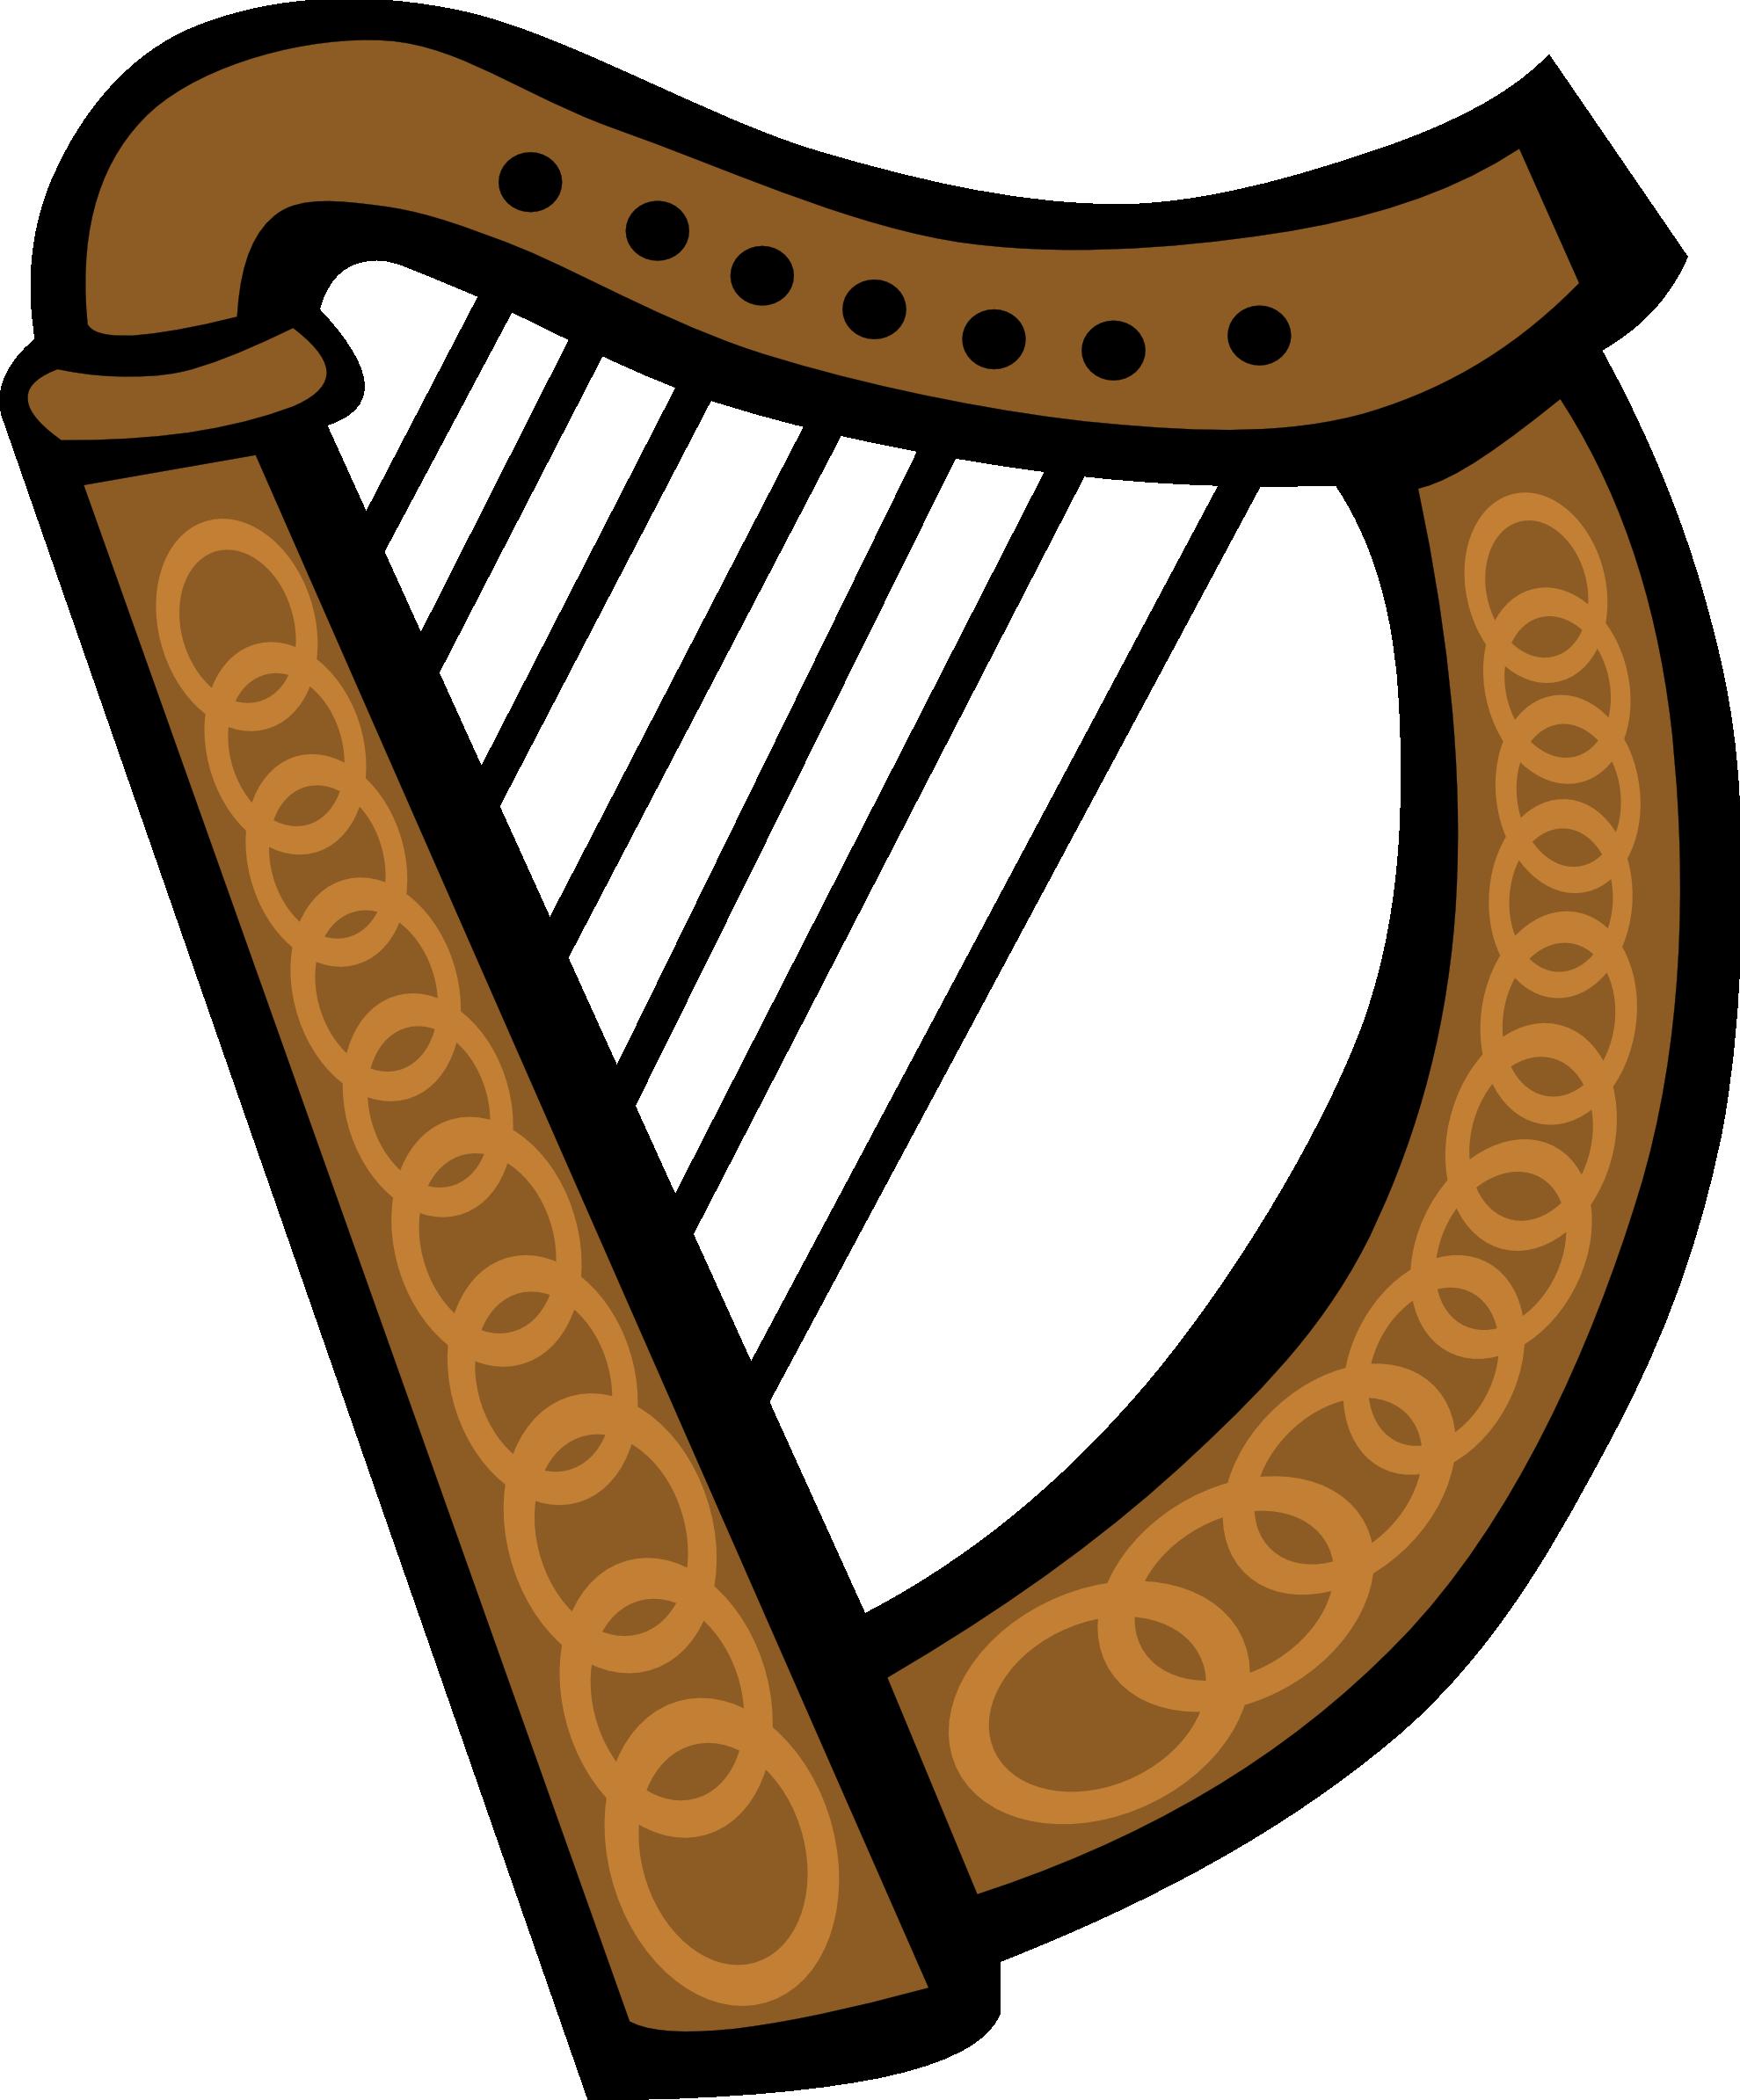 Harp clipart 3 - Harp Clipart